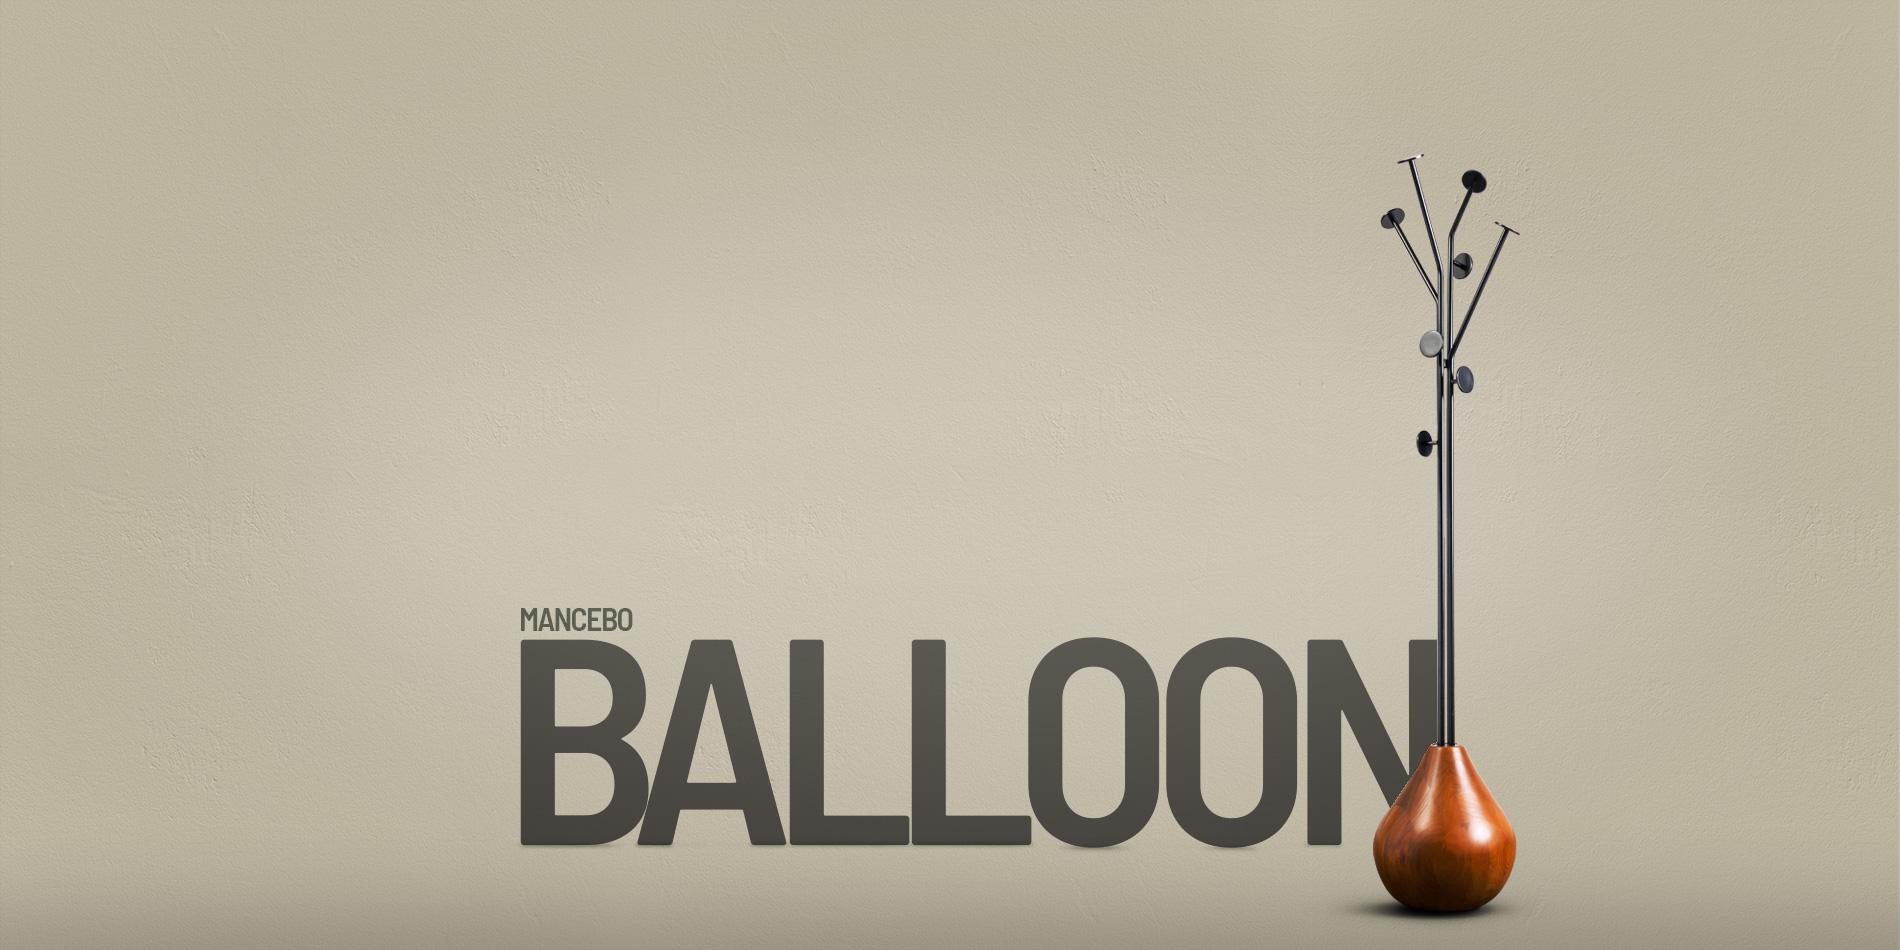 mancebo balloon